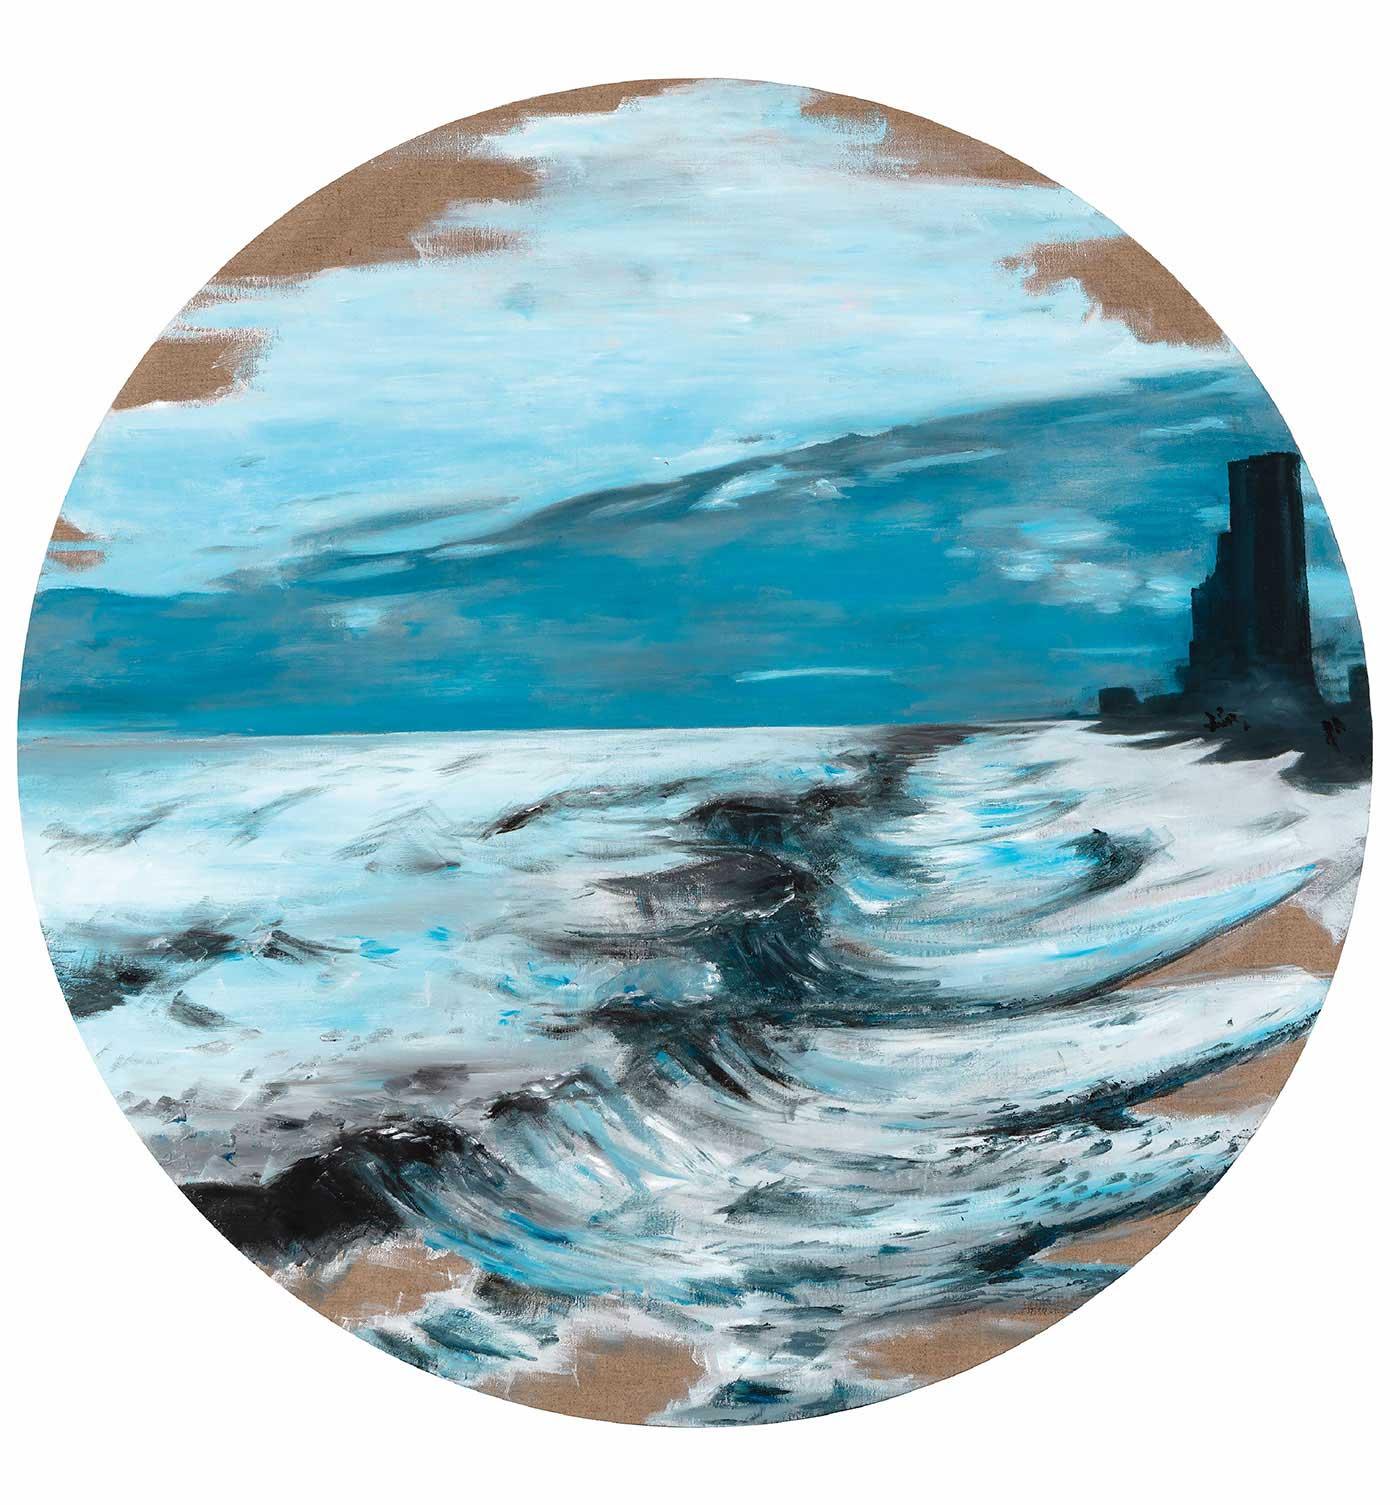 Eliese M. Donhardt - Pensacola Beach